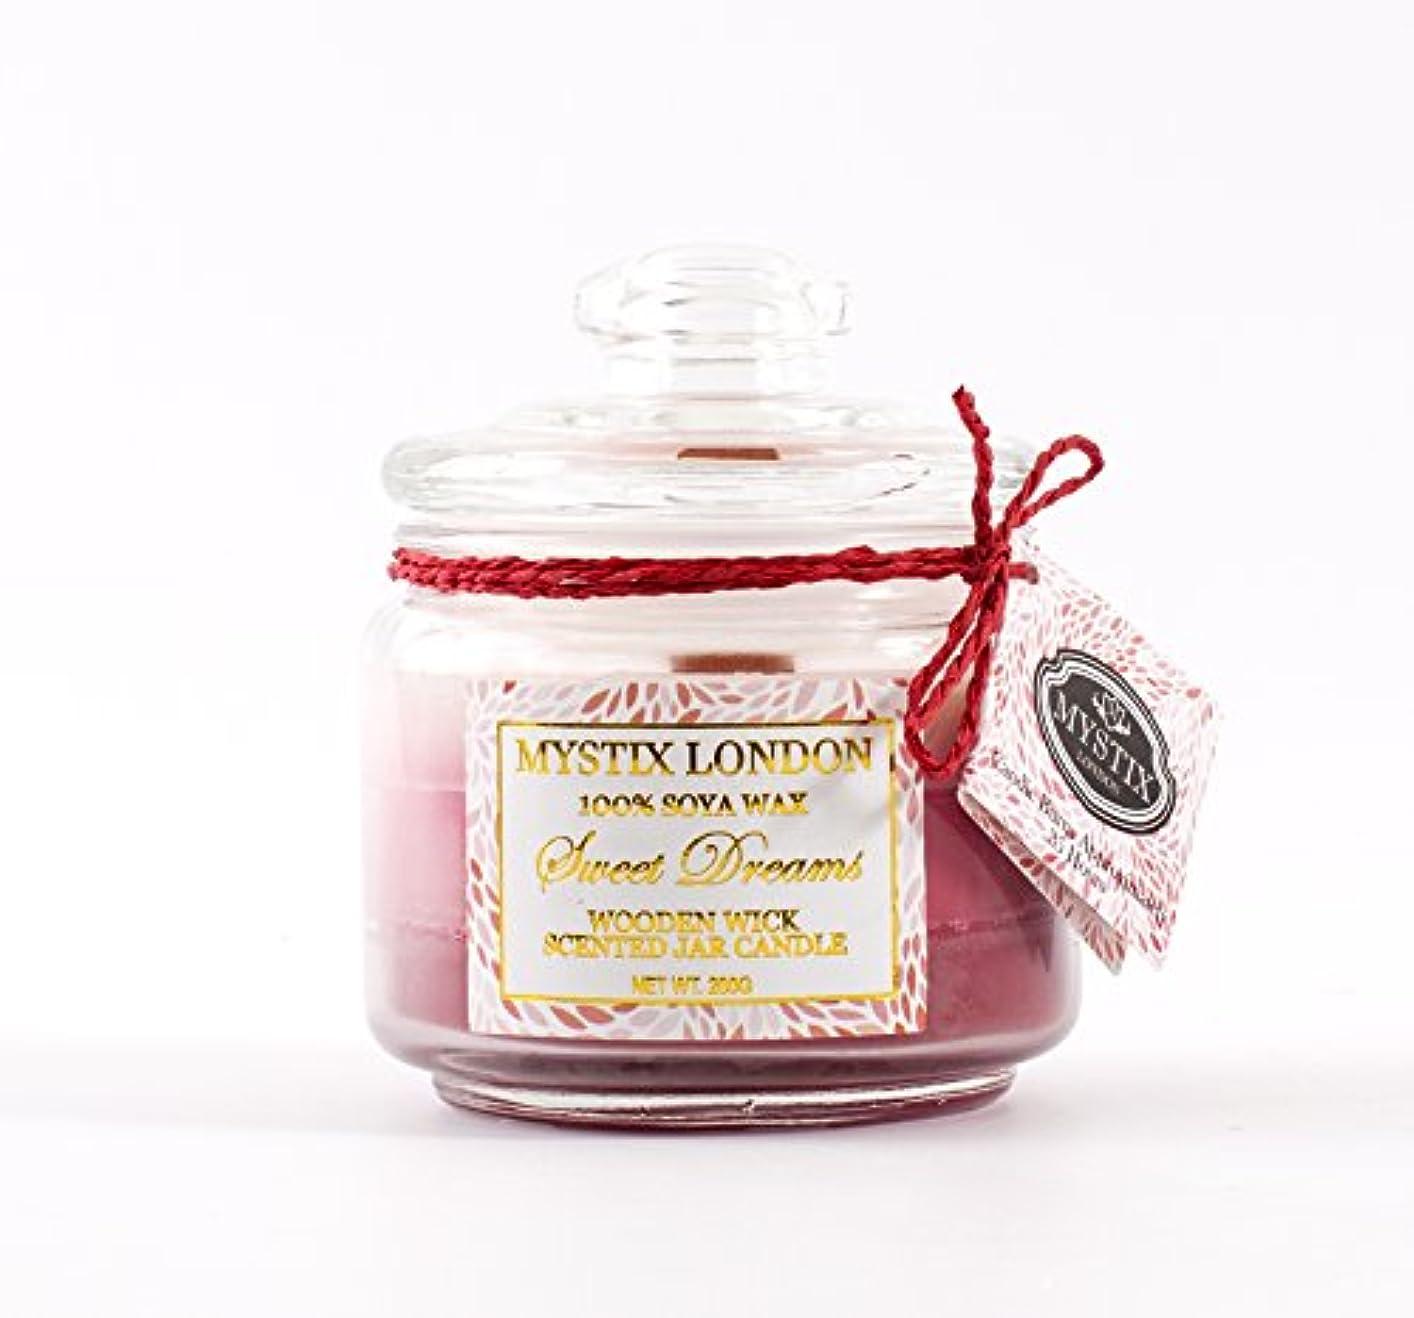 例革命的混合Mystix London | Sweet Dreams Wooden Wick Scented Jar Candle 200g